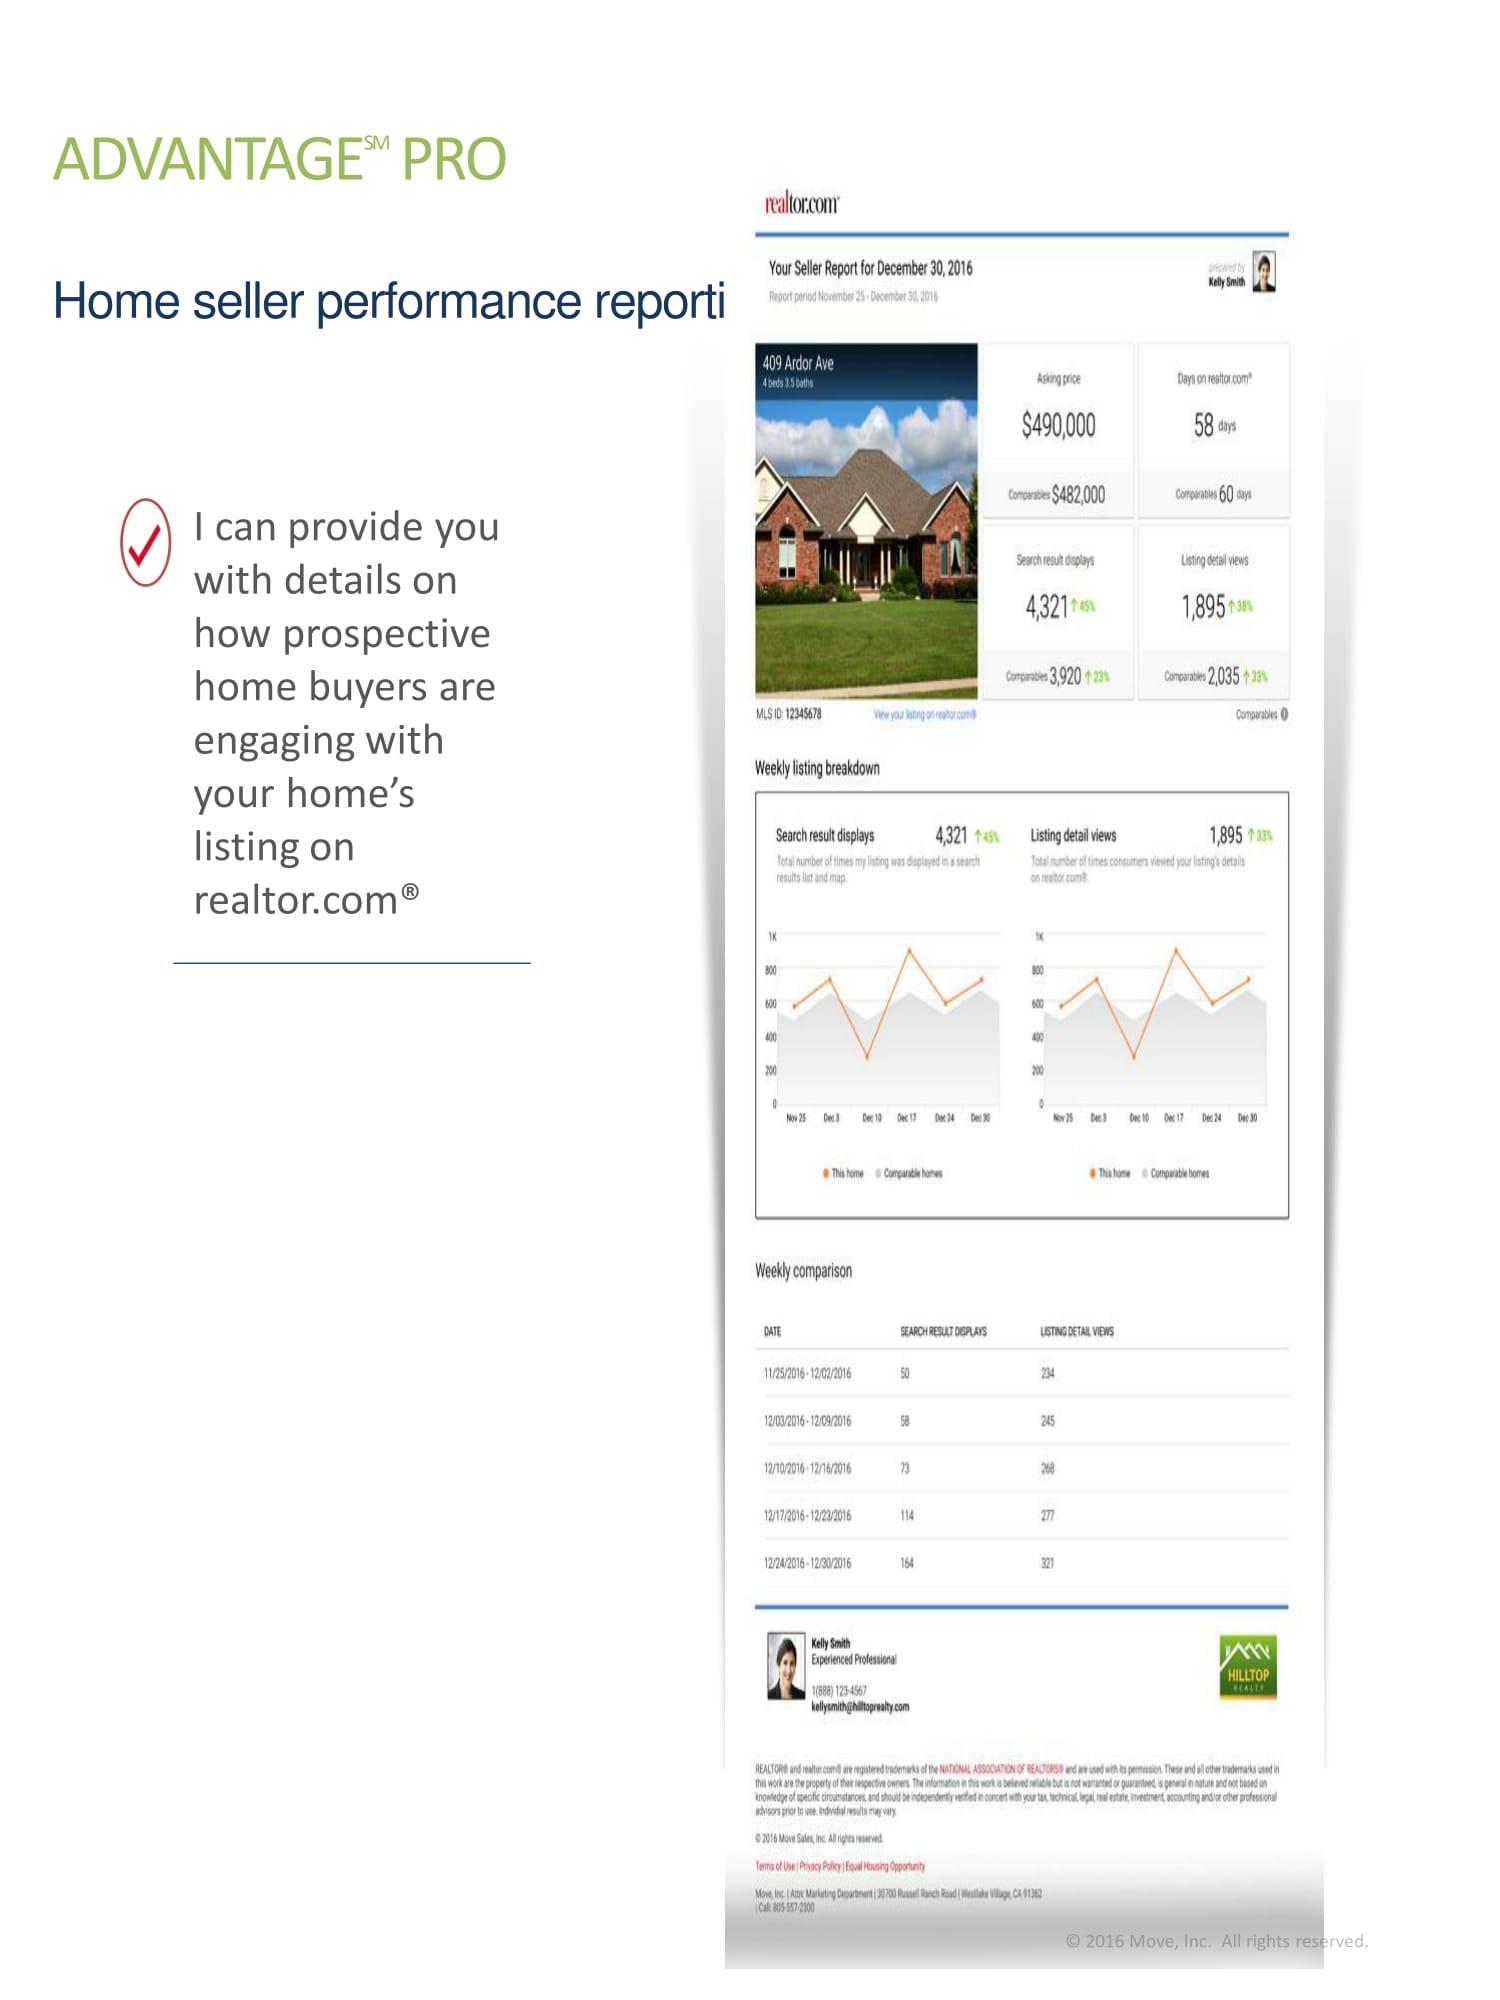 A - Do they enhance their listings on Realtor.com-2